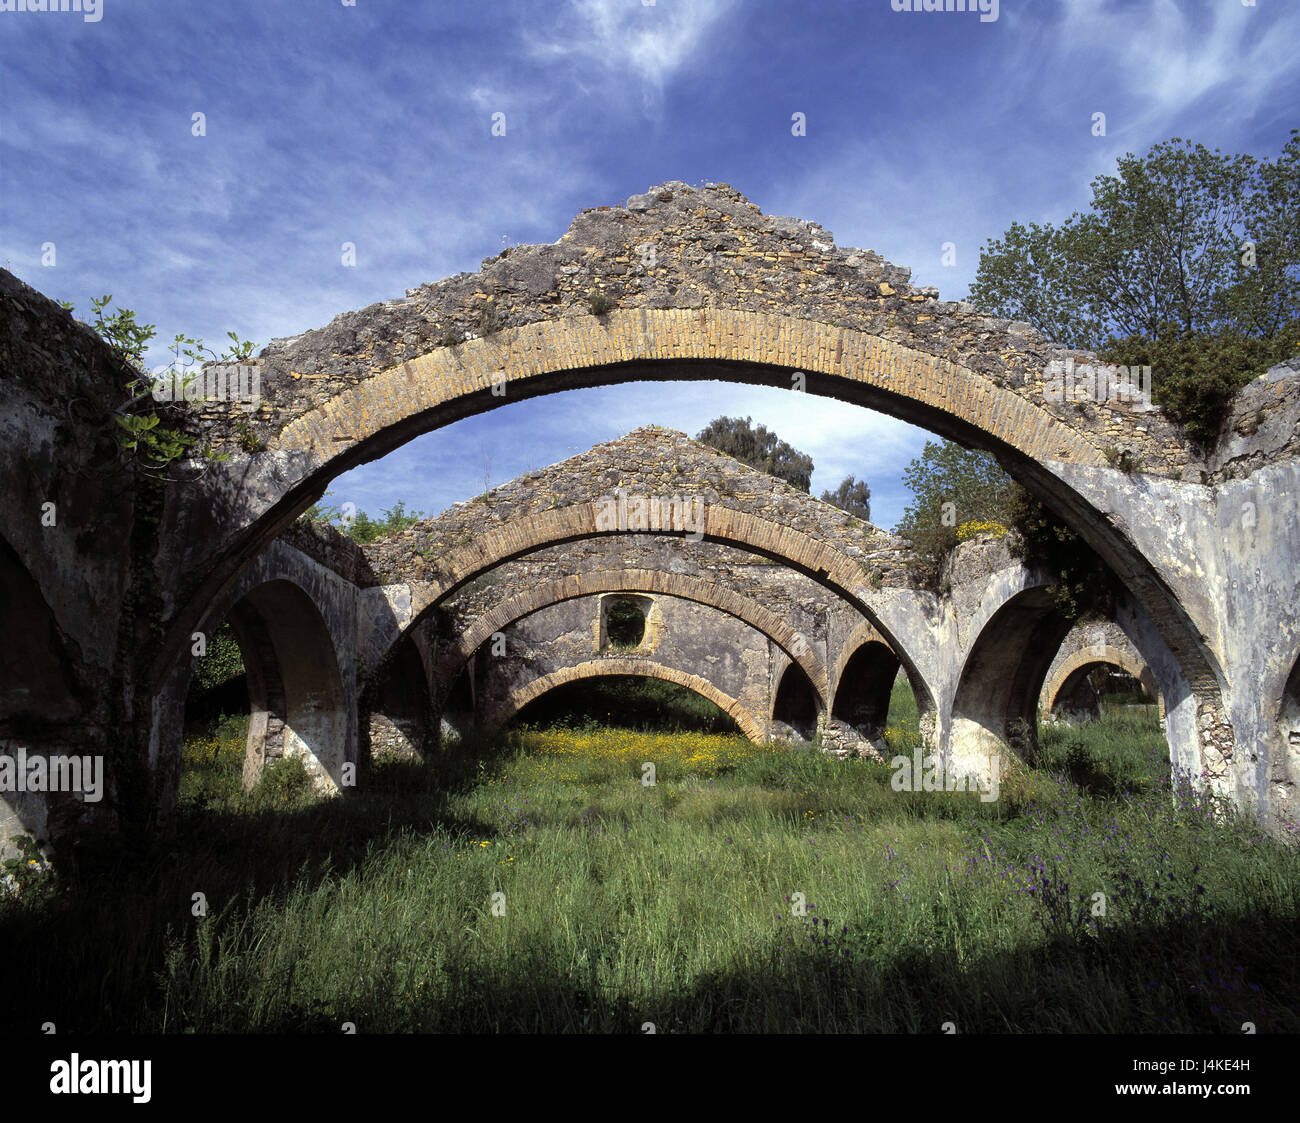 Greece, Corfu, Gouvia, dockyard, Venetian, ship halls Europe, Ionian islands, island, ship houses, 18 cent., curves, - Stock Image